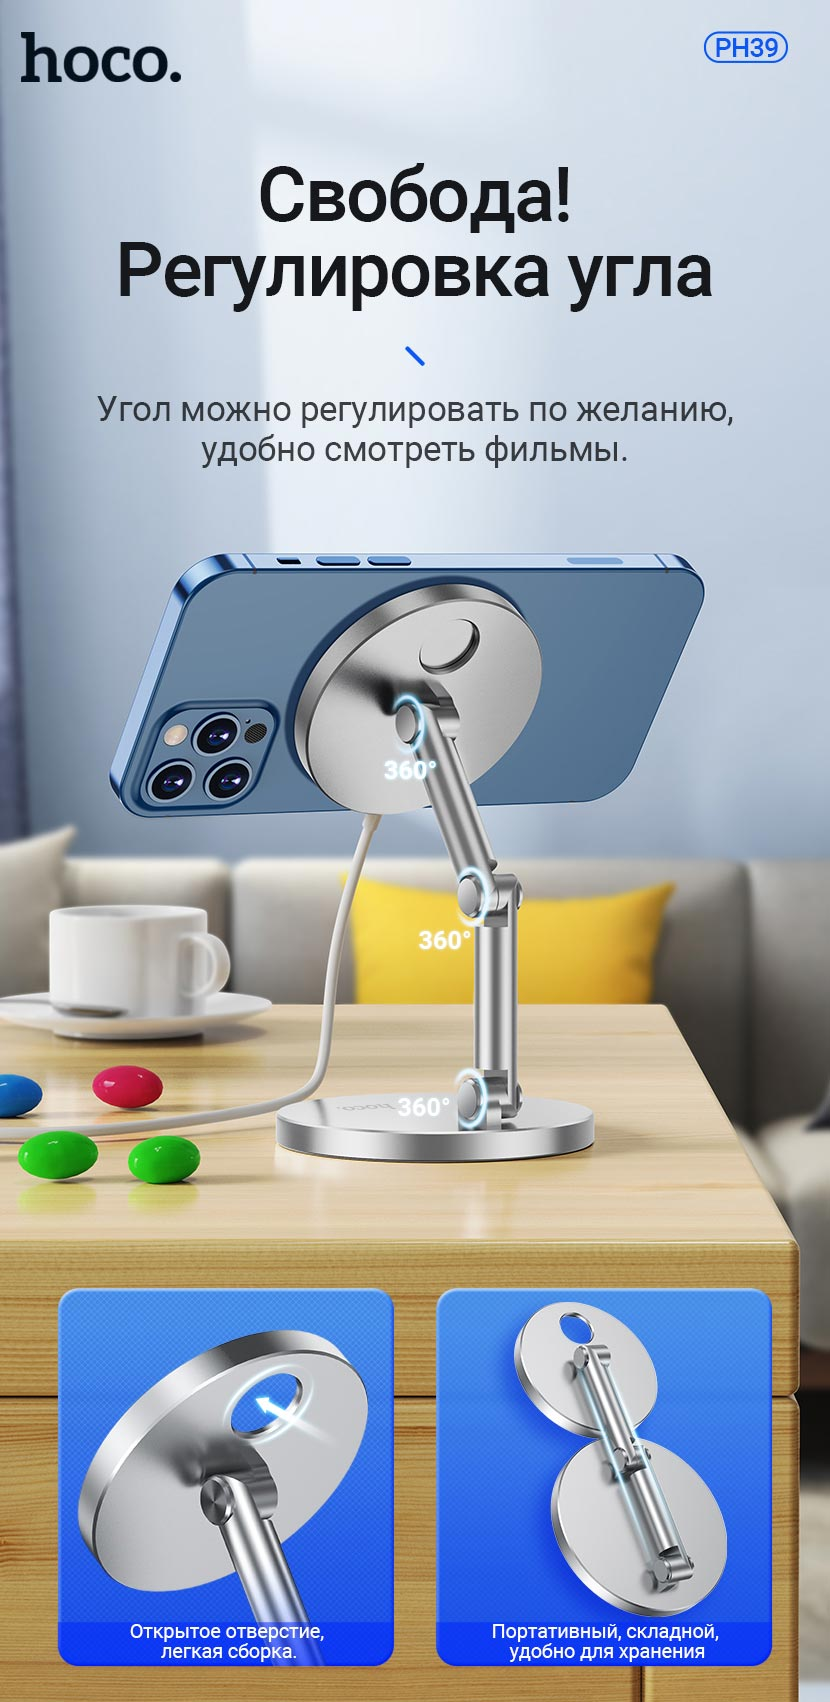 hoco news ph39 daring magnetic desktop stand with wireless charging adjust ru